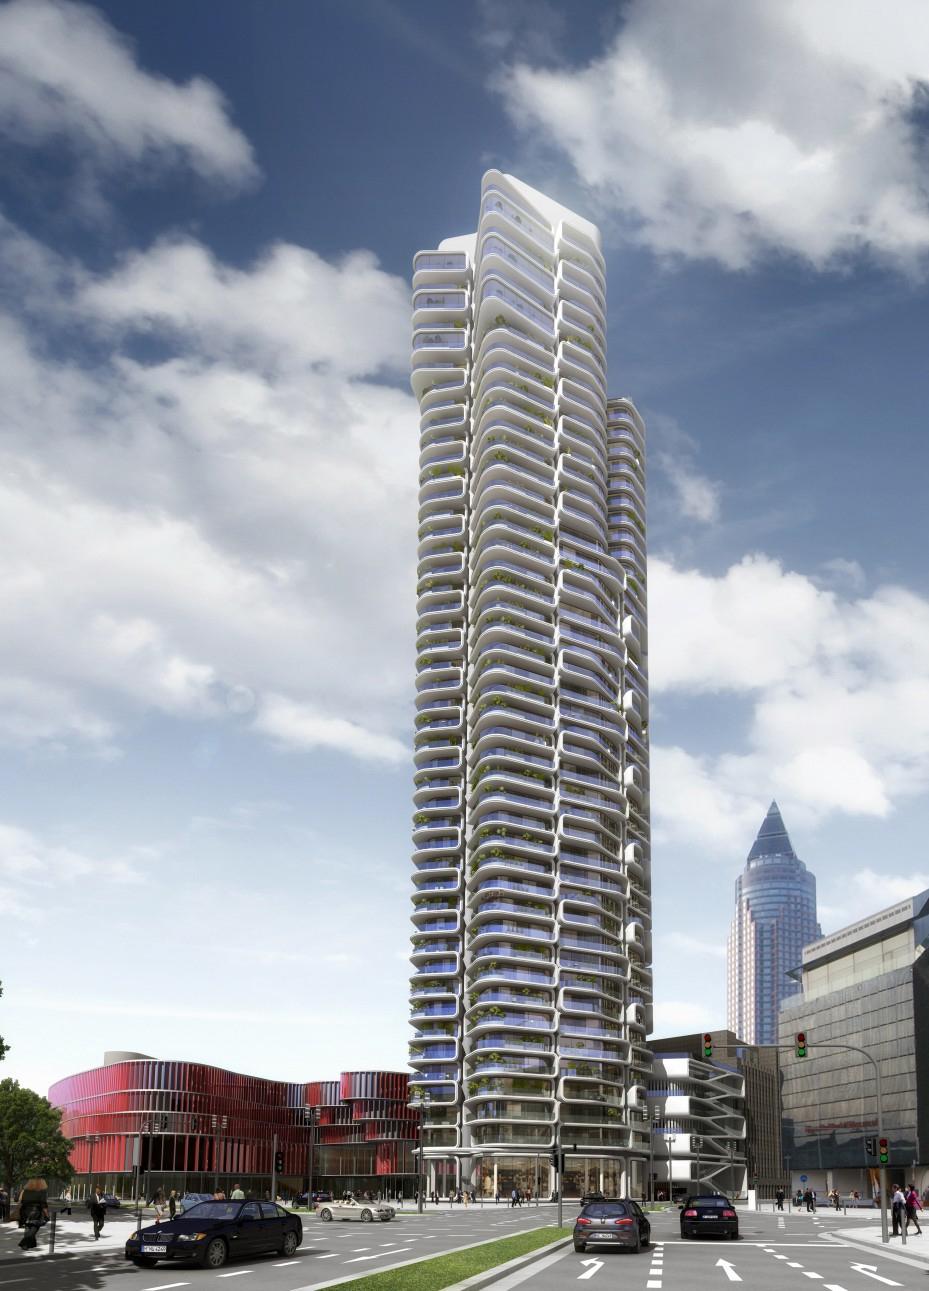 frankfurt grand tower 172m 47 fl t o skyscrapercity. Black Bedroom Furniture Sets. Home Design Ideas